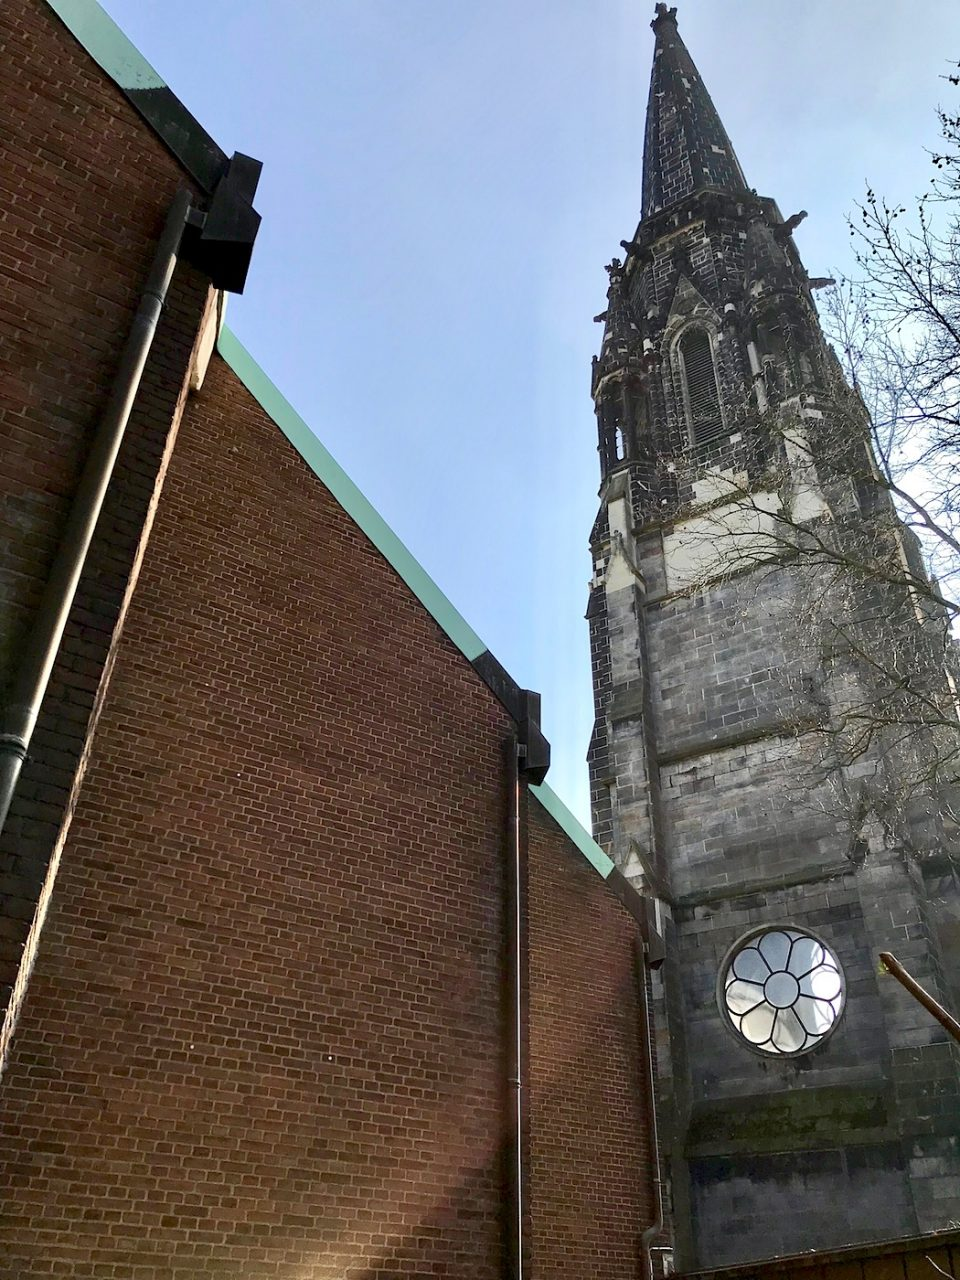 Christuskirche Bochum.  ... 1957 fertiggestellt wurde.